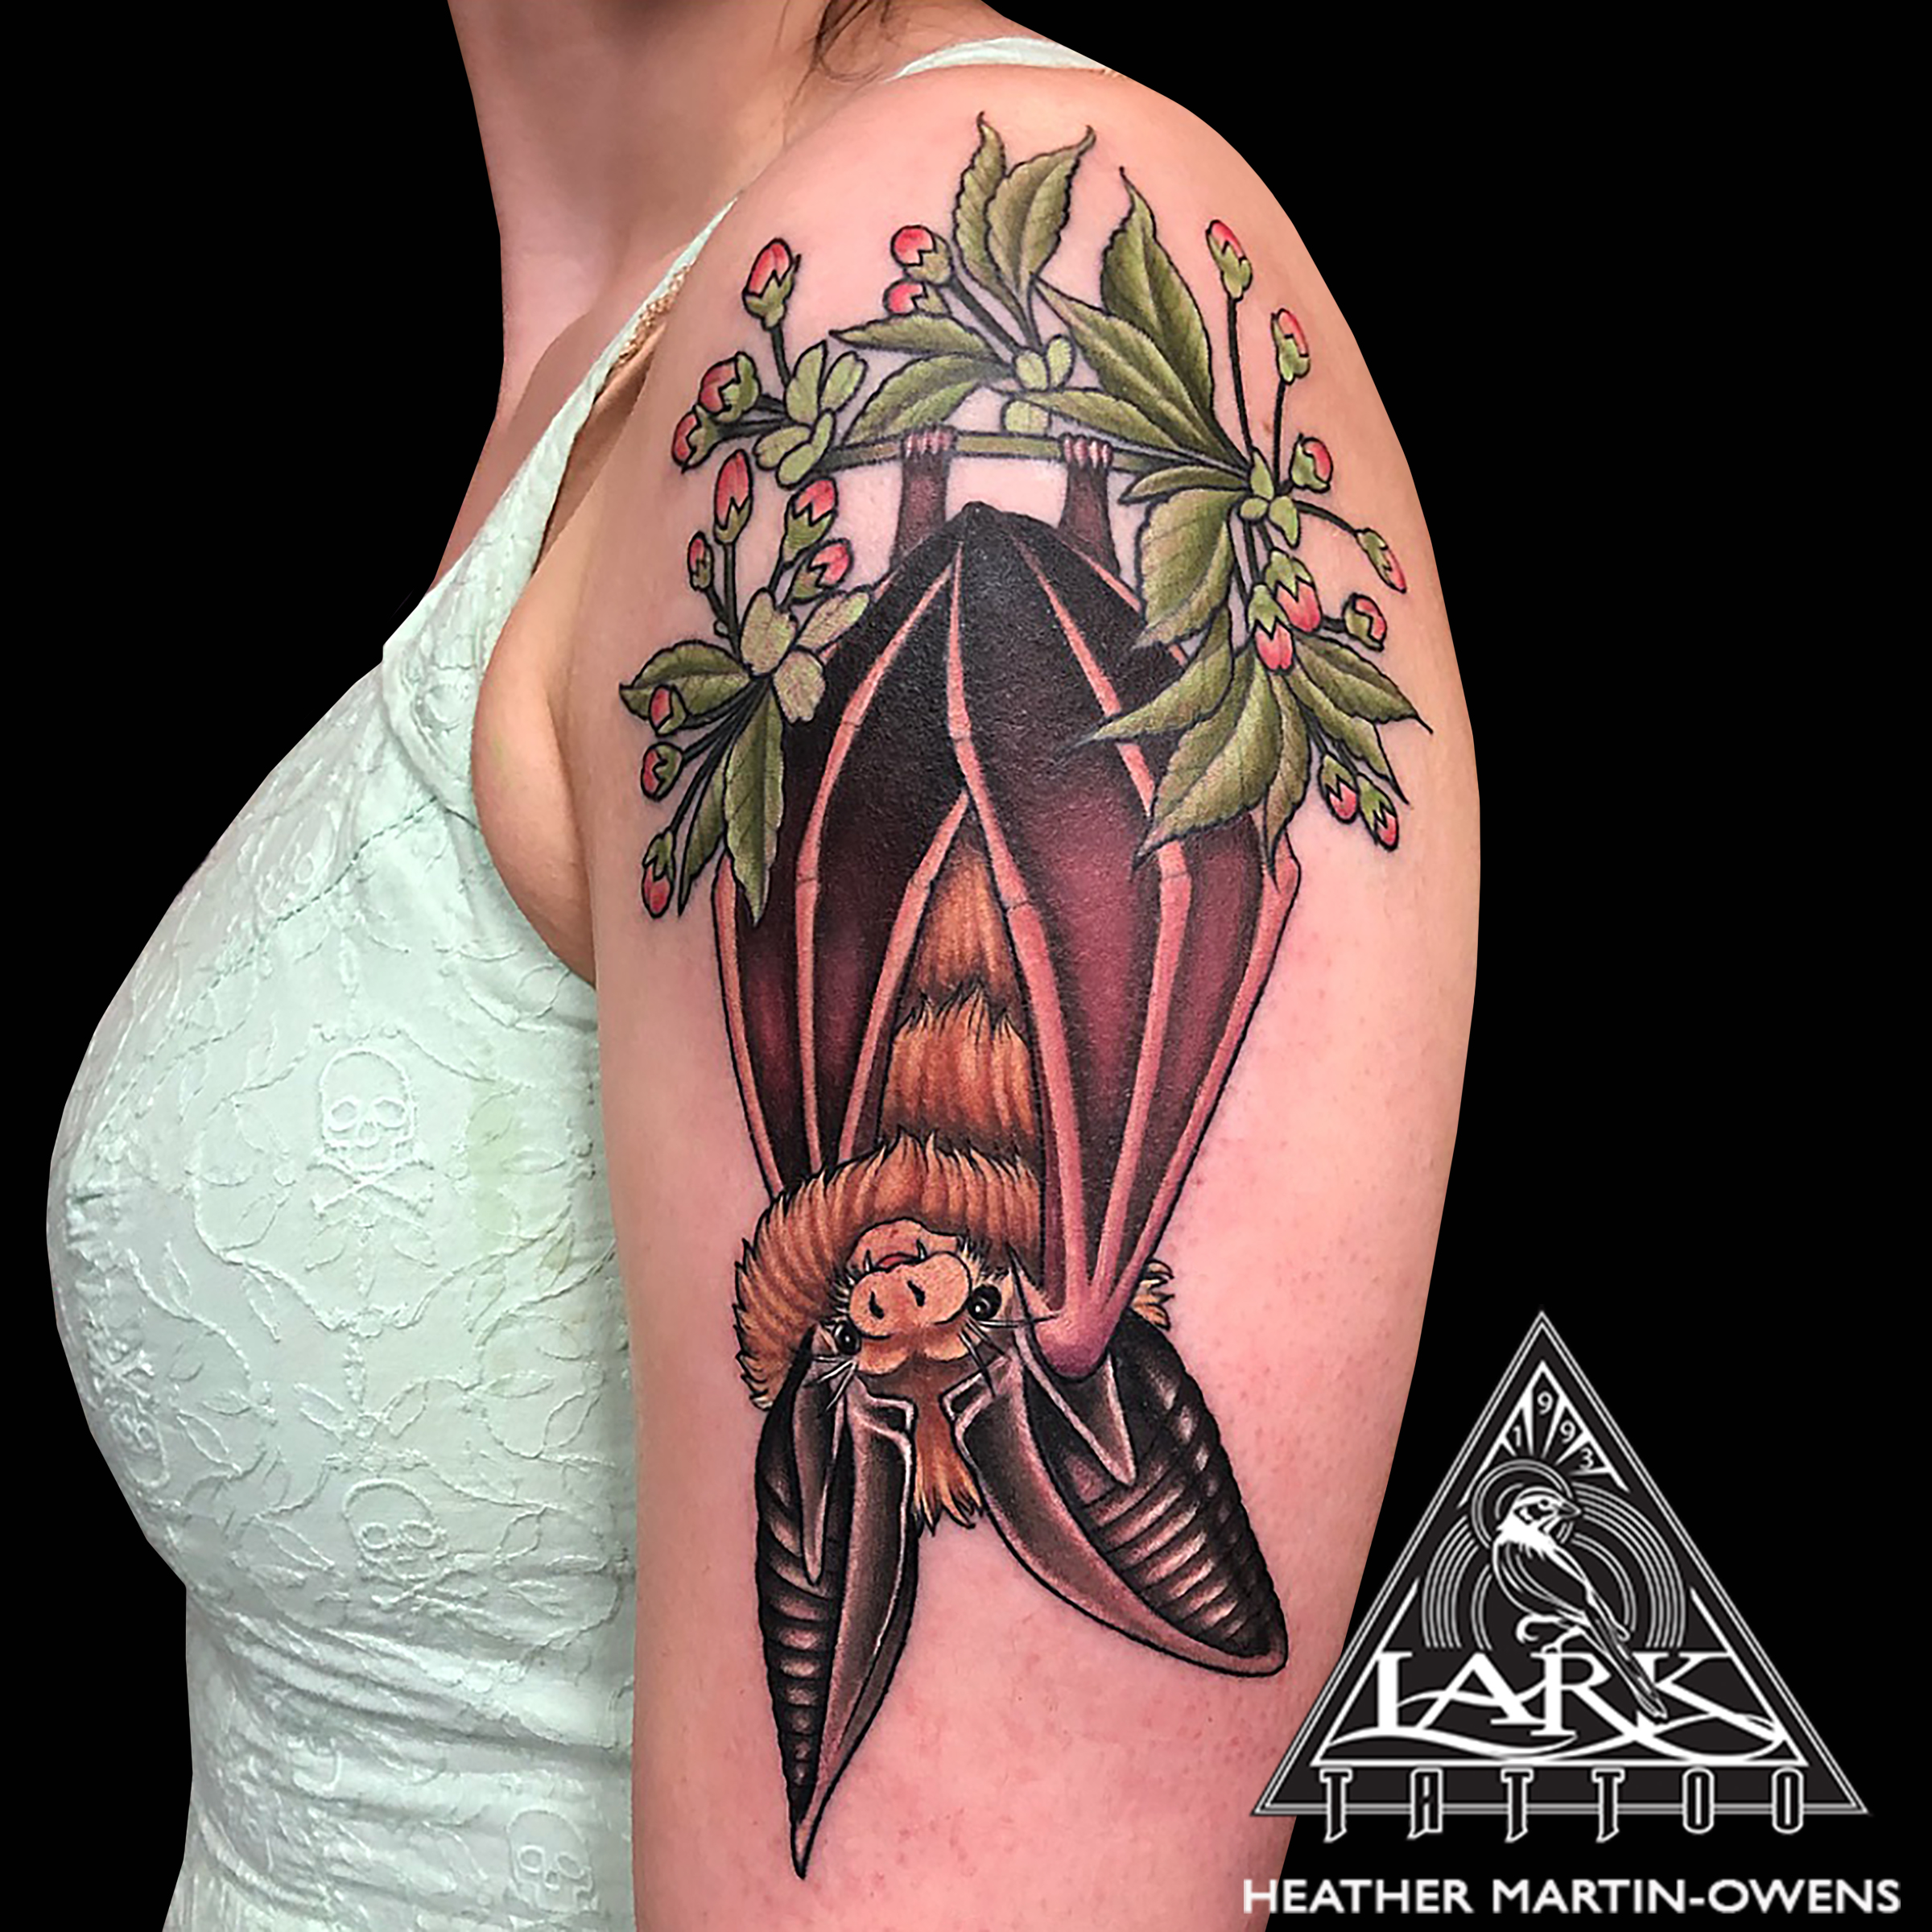 colortattoo, bat, battattoo, brownbat, brownbattattoo, EuropeanLongEaredBrownBat, EuropeanLongEaredBrownBatTattoo, armtattoo, cherryblossom, cherryblossomtattoo, femaletattoo, femaletattooartist, femaletattooer, ladytattooer, femaleartist, tattoo, tattoos, tat, tats, tatts, tatted, tattedup, tattoist, tattooed, inked, inkedup, ink, tattoooftheday, amazingink, bodyart, tattooig, tattoosofinstagram, instatats , larktattoo, larktattoos, larktattoowestbury, westbury, longisland, NY, NewYork, usa, art, heather, Martin, owens